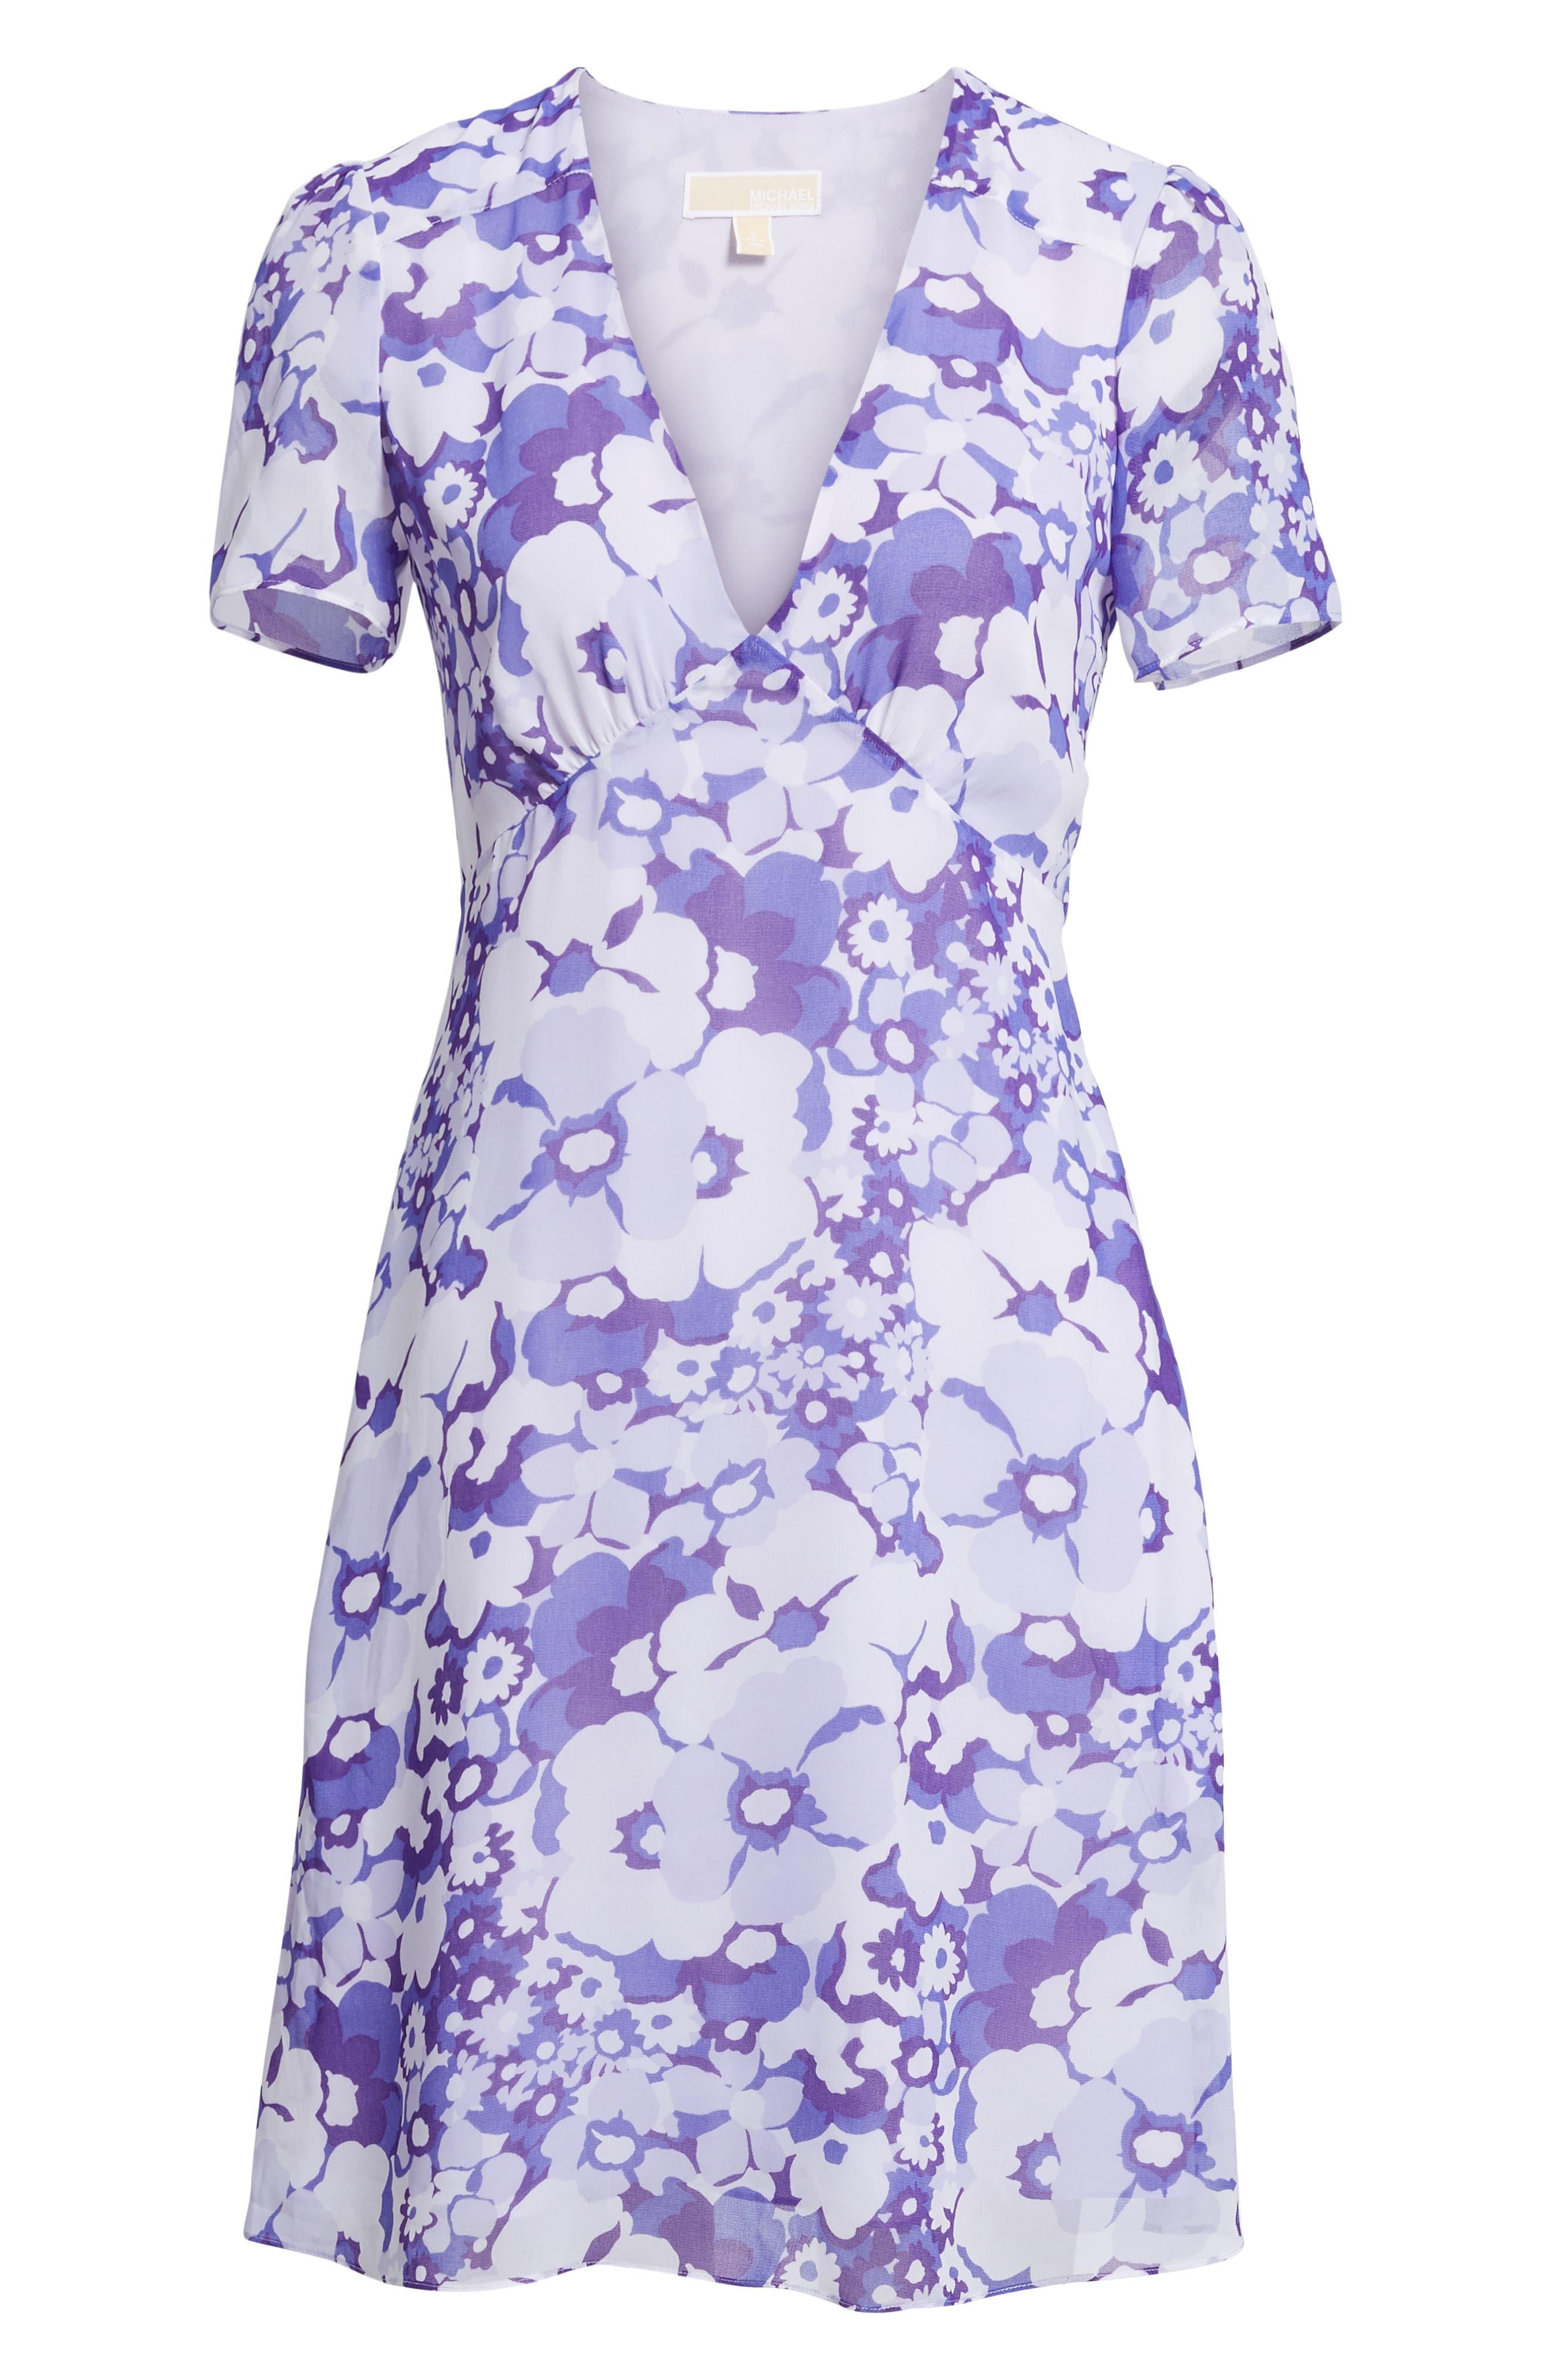 Springtime Floral Dress,                             Alternate thumbnail 6, color,                             580